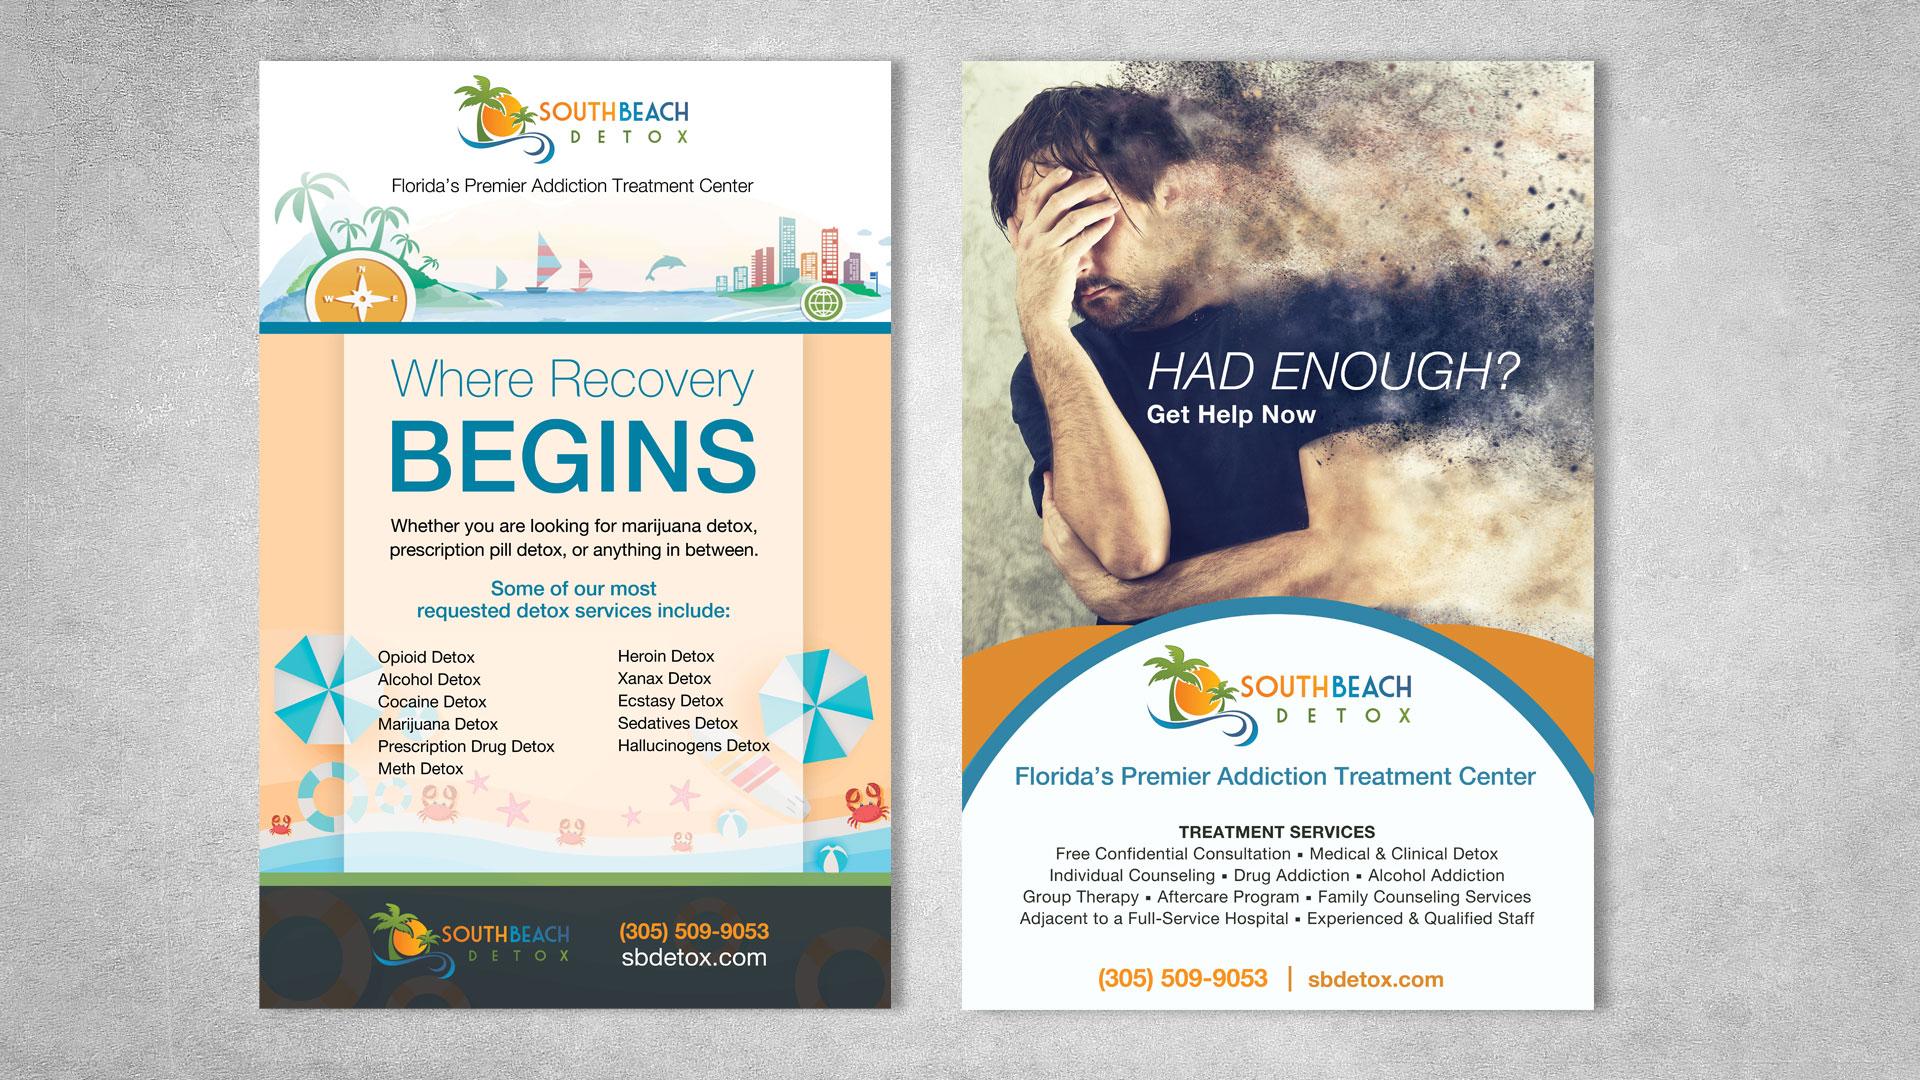 South Beach Detox Posters 24x36